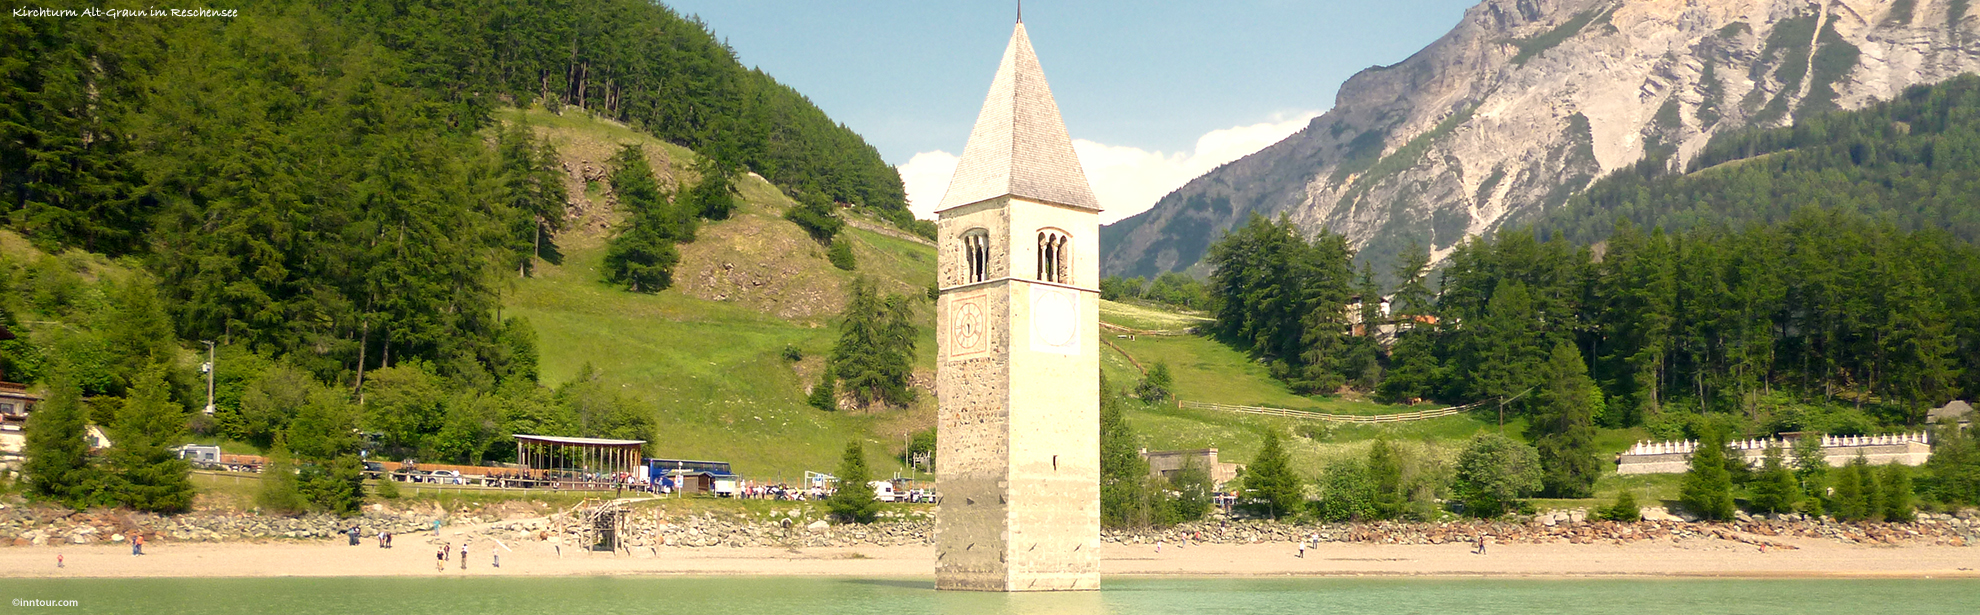 Oklass1inntour_Alt-Graun-im-Reschensee_P1010596